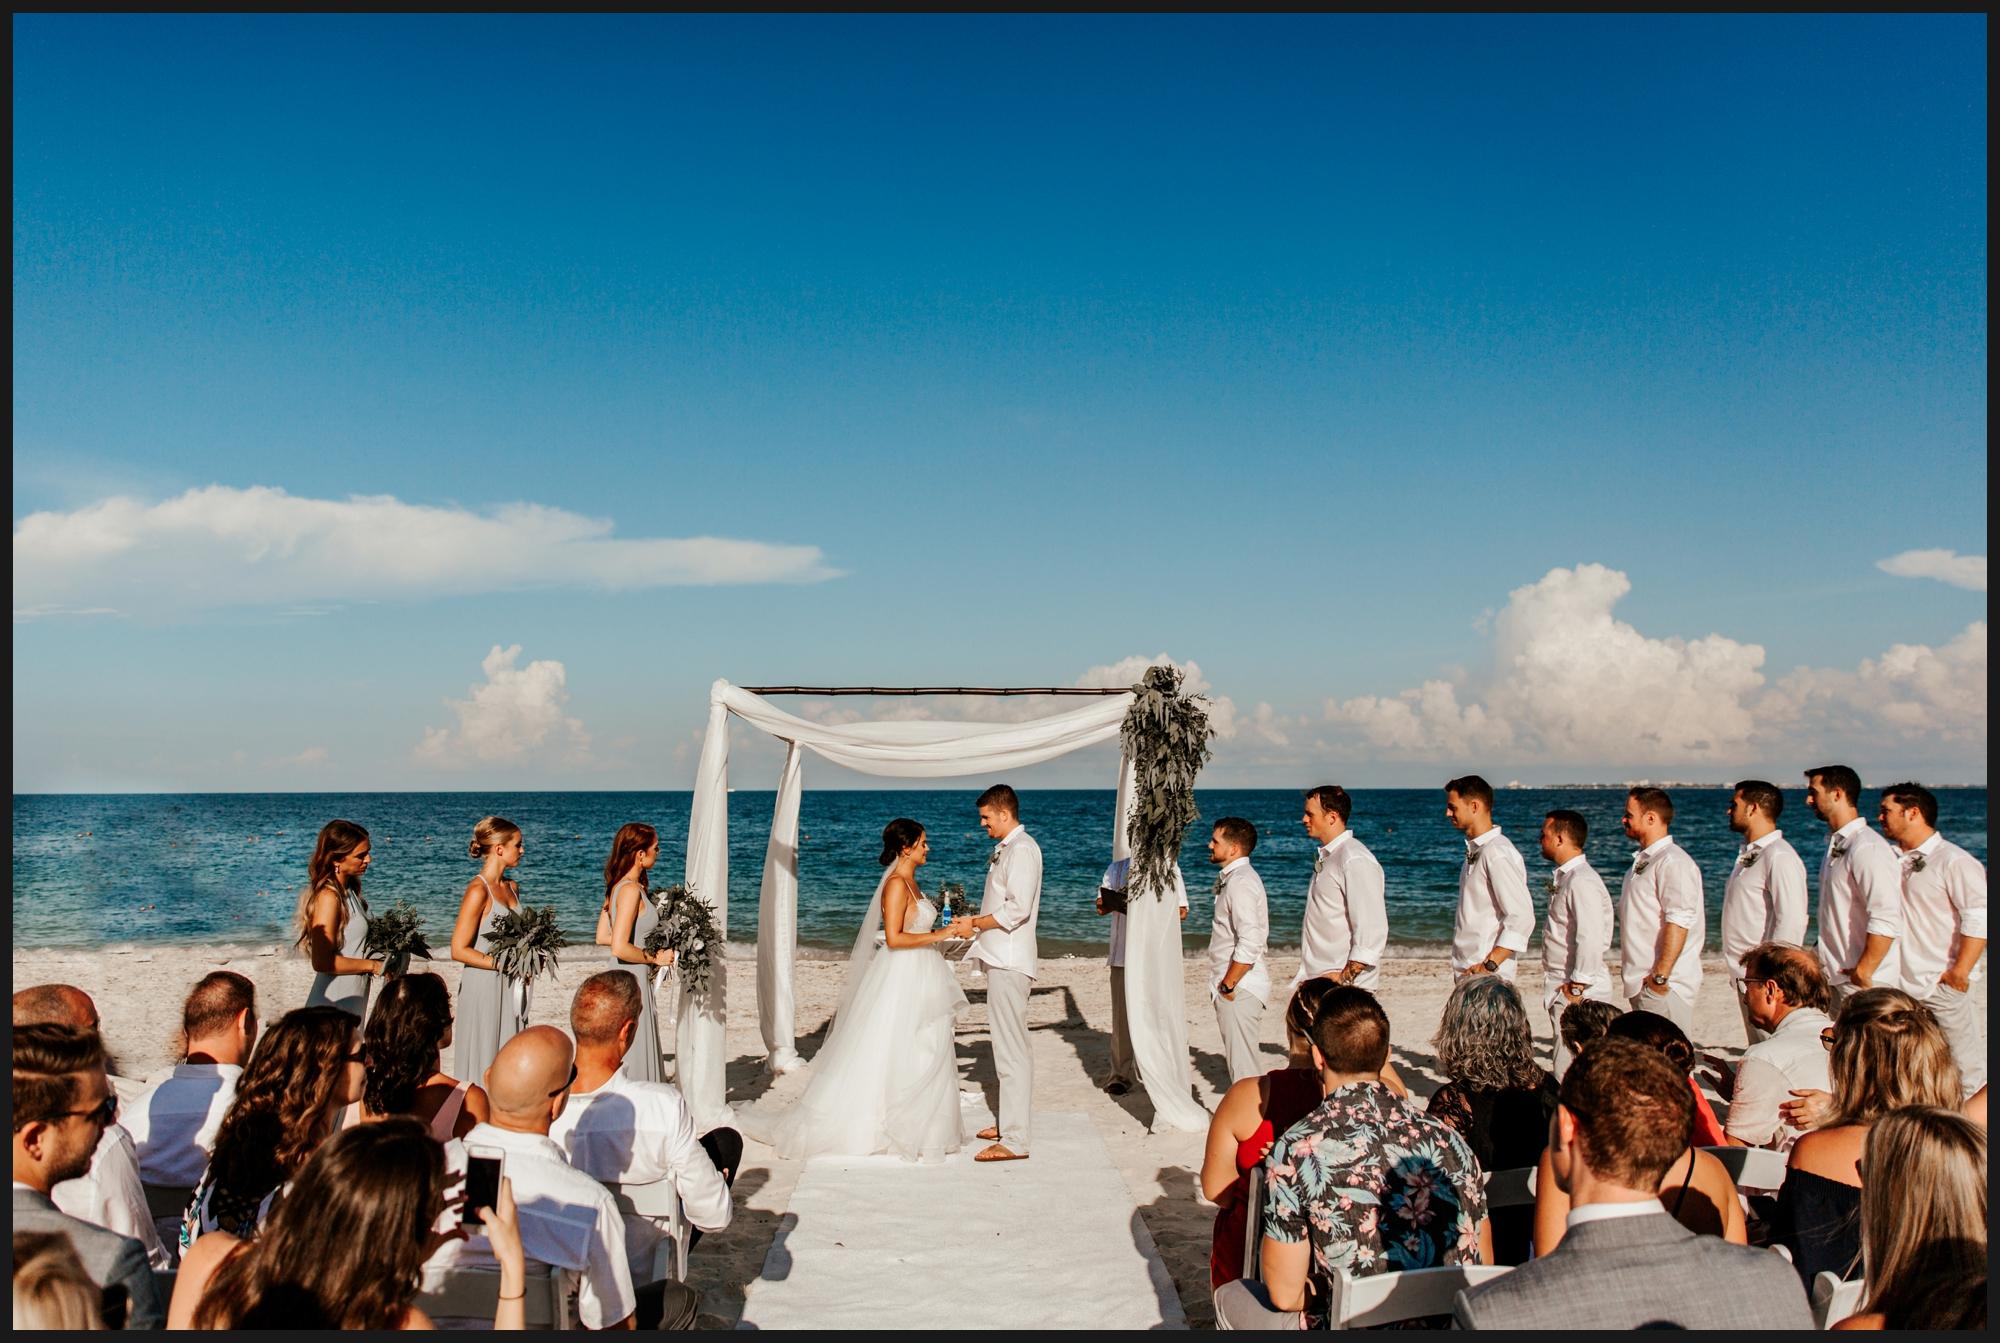 Orlando-Wedding-Photographer-destination-wedding-photographer-florida-wedding-photographer-bohemian-wedding-photographer_0505.jpg